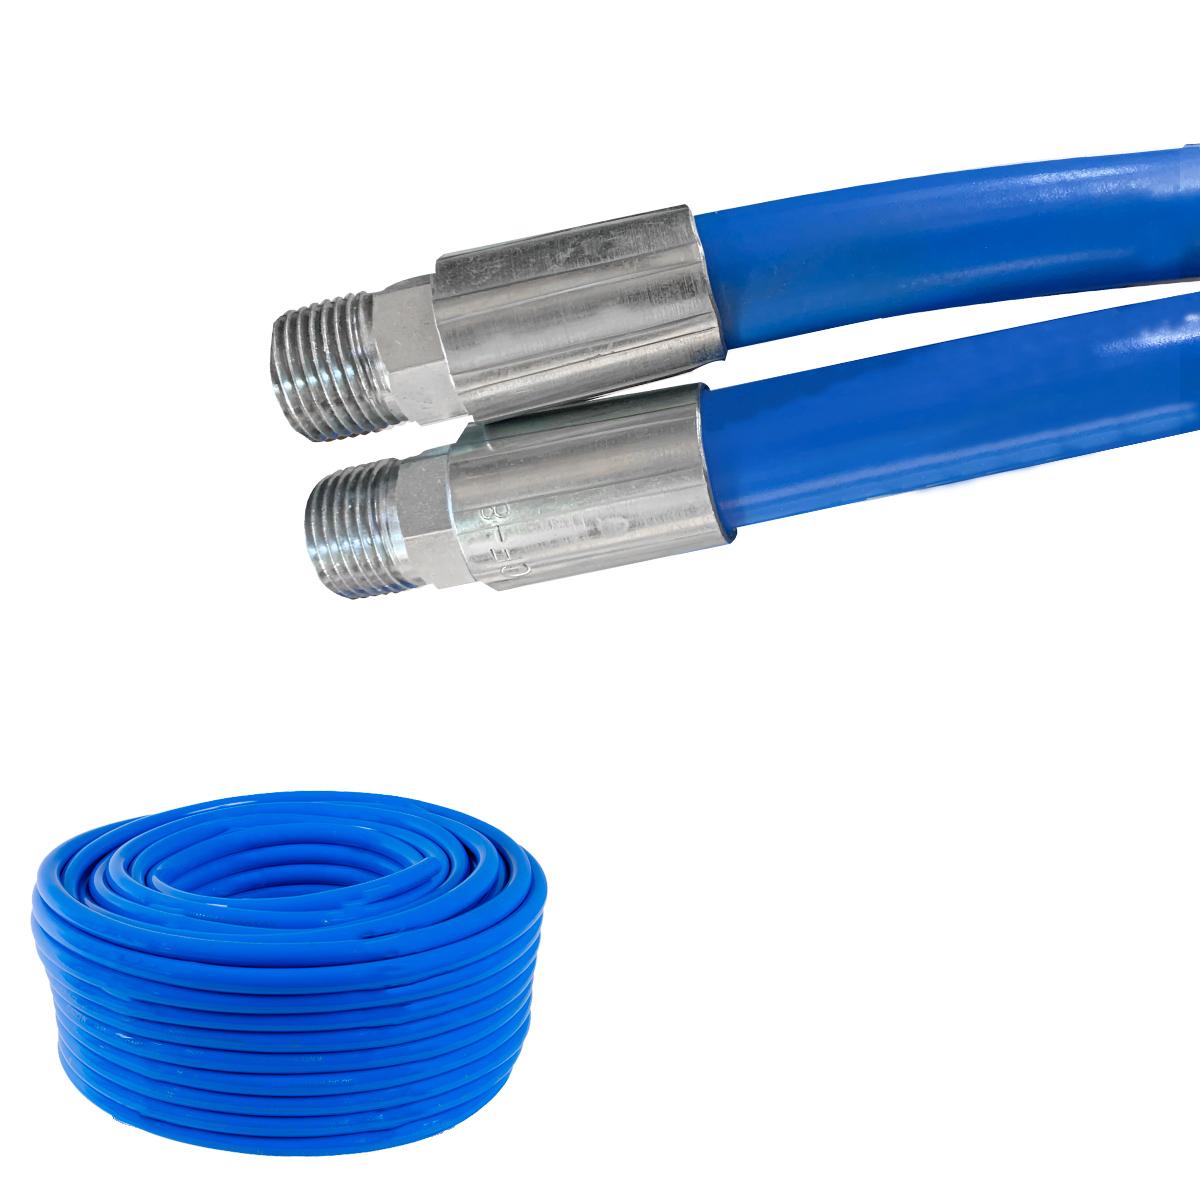 Mangueira 1/2 Lava Jato 2500 Lbs Ibirá Azul C/ Terminal